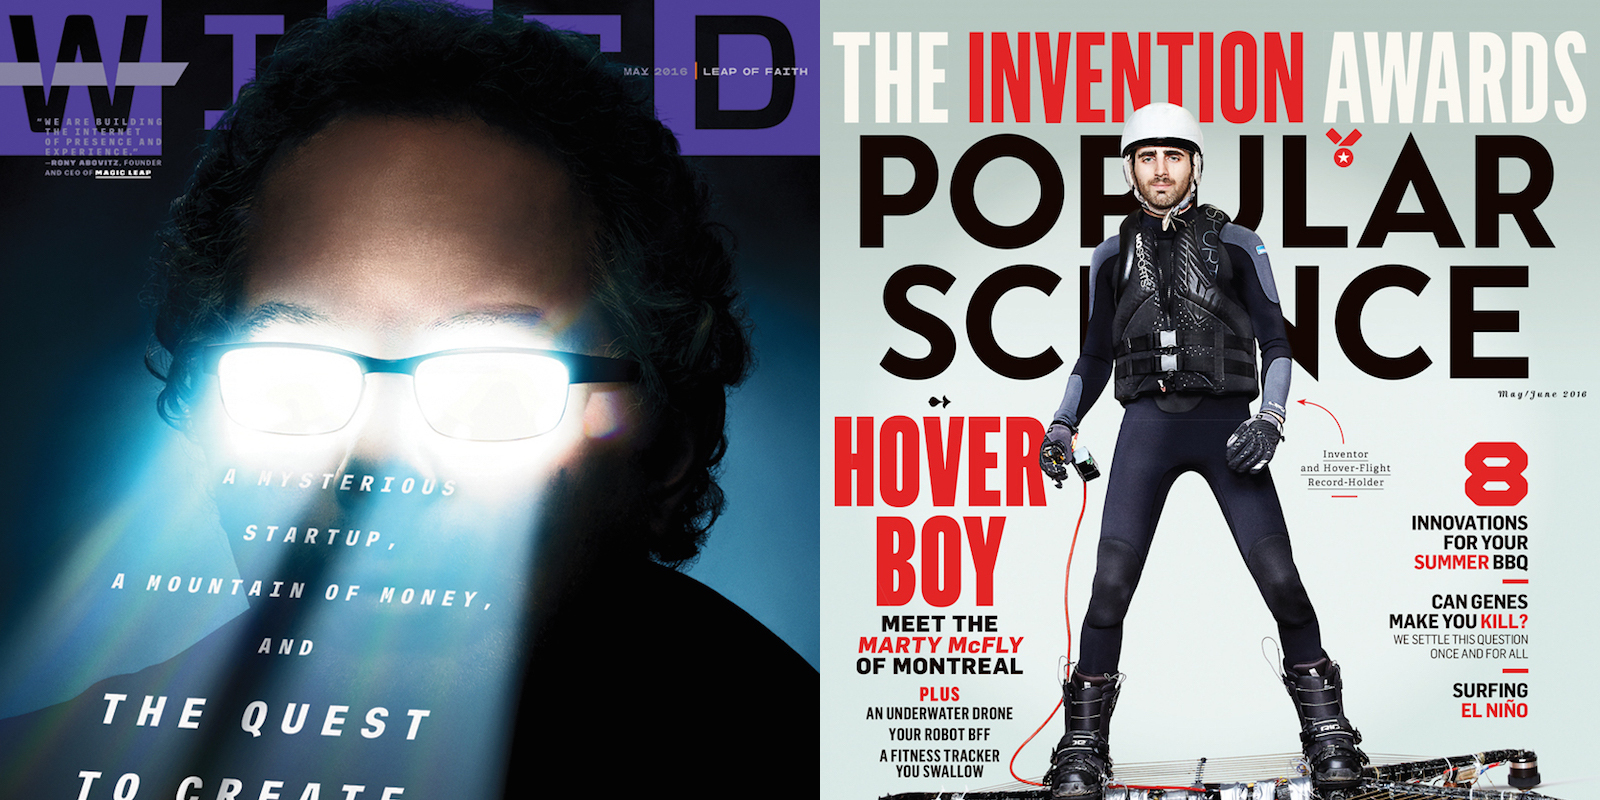 Memorial Day magazine bundles - titles from $4/yr: Wired, GQ, ESPN